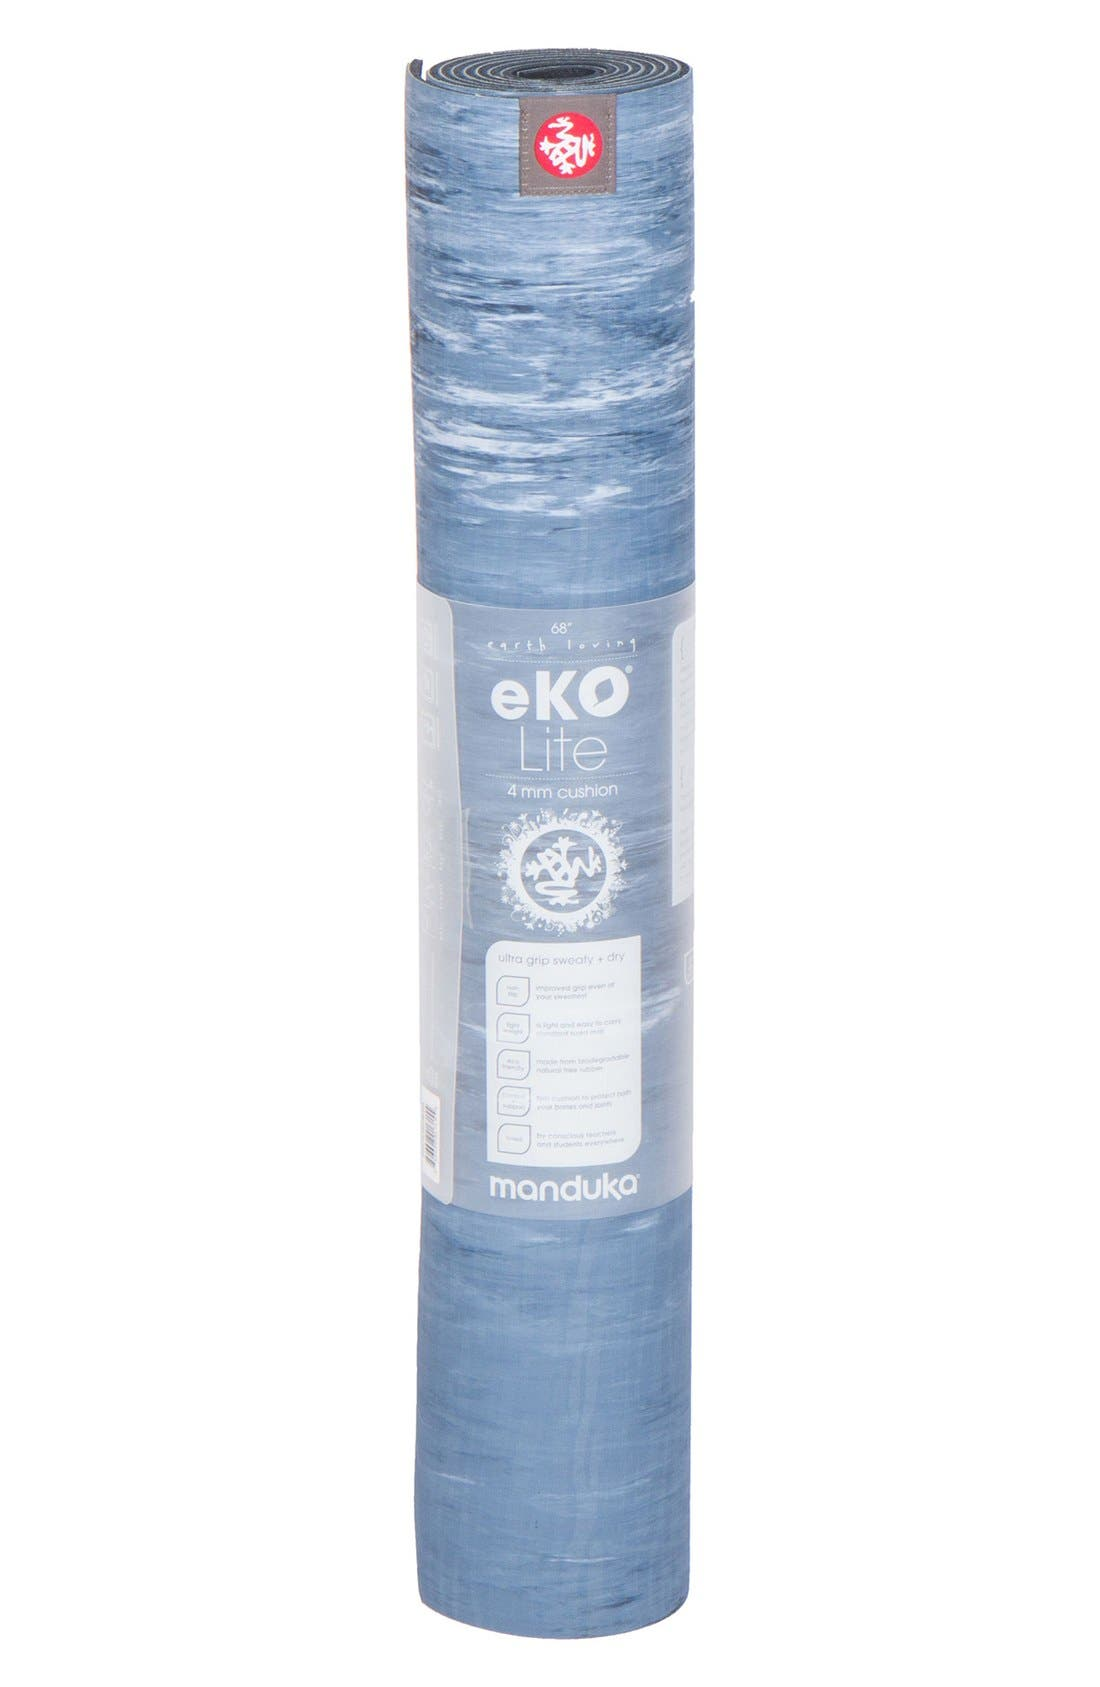 Alternate Image 1 Selected - Manduka eKO 4mm Marble Yoga Mat